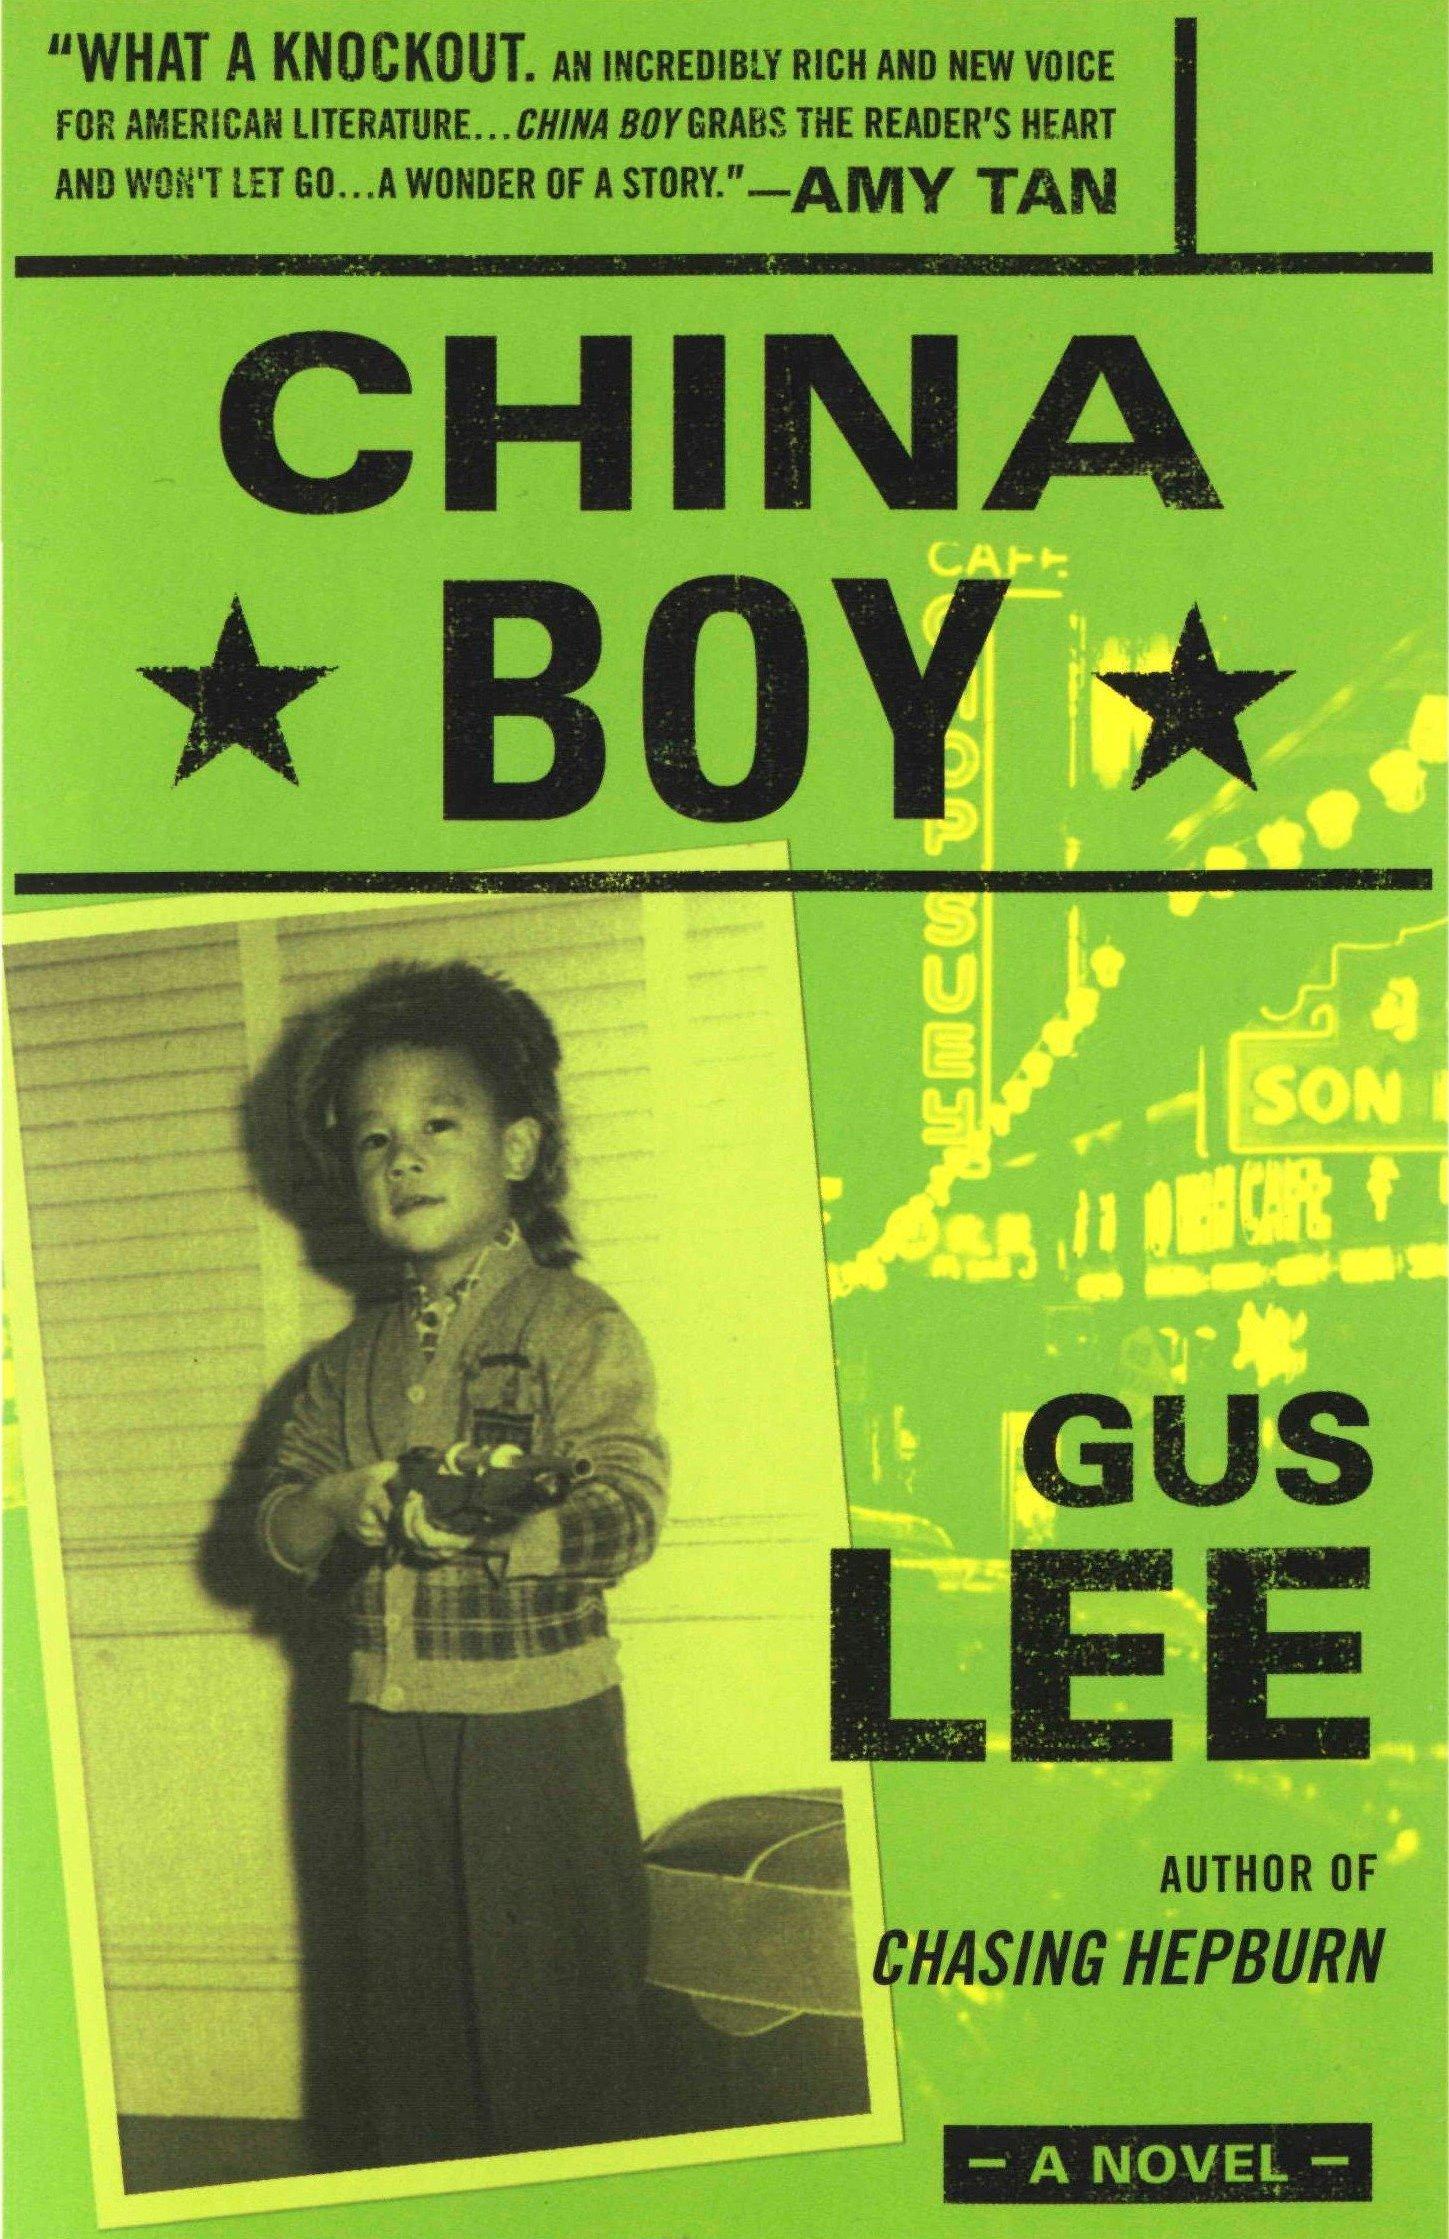 Amazon.com: China Boy: 9780452271586: Lee, Gus: Books